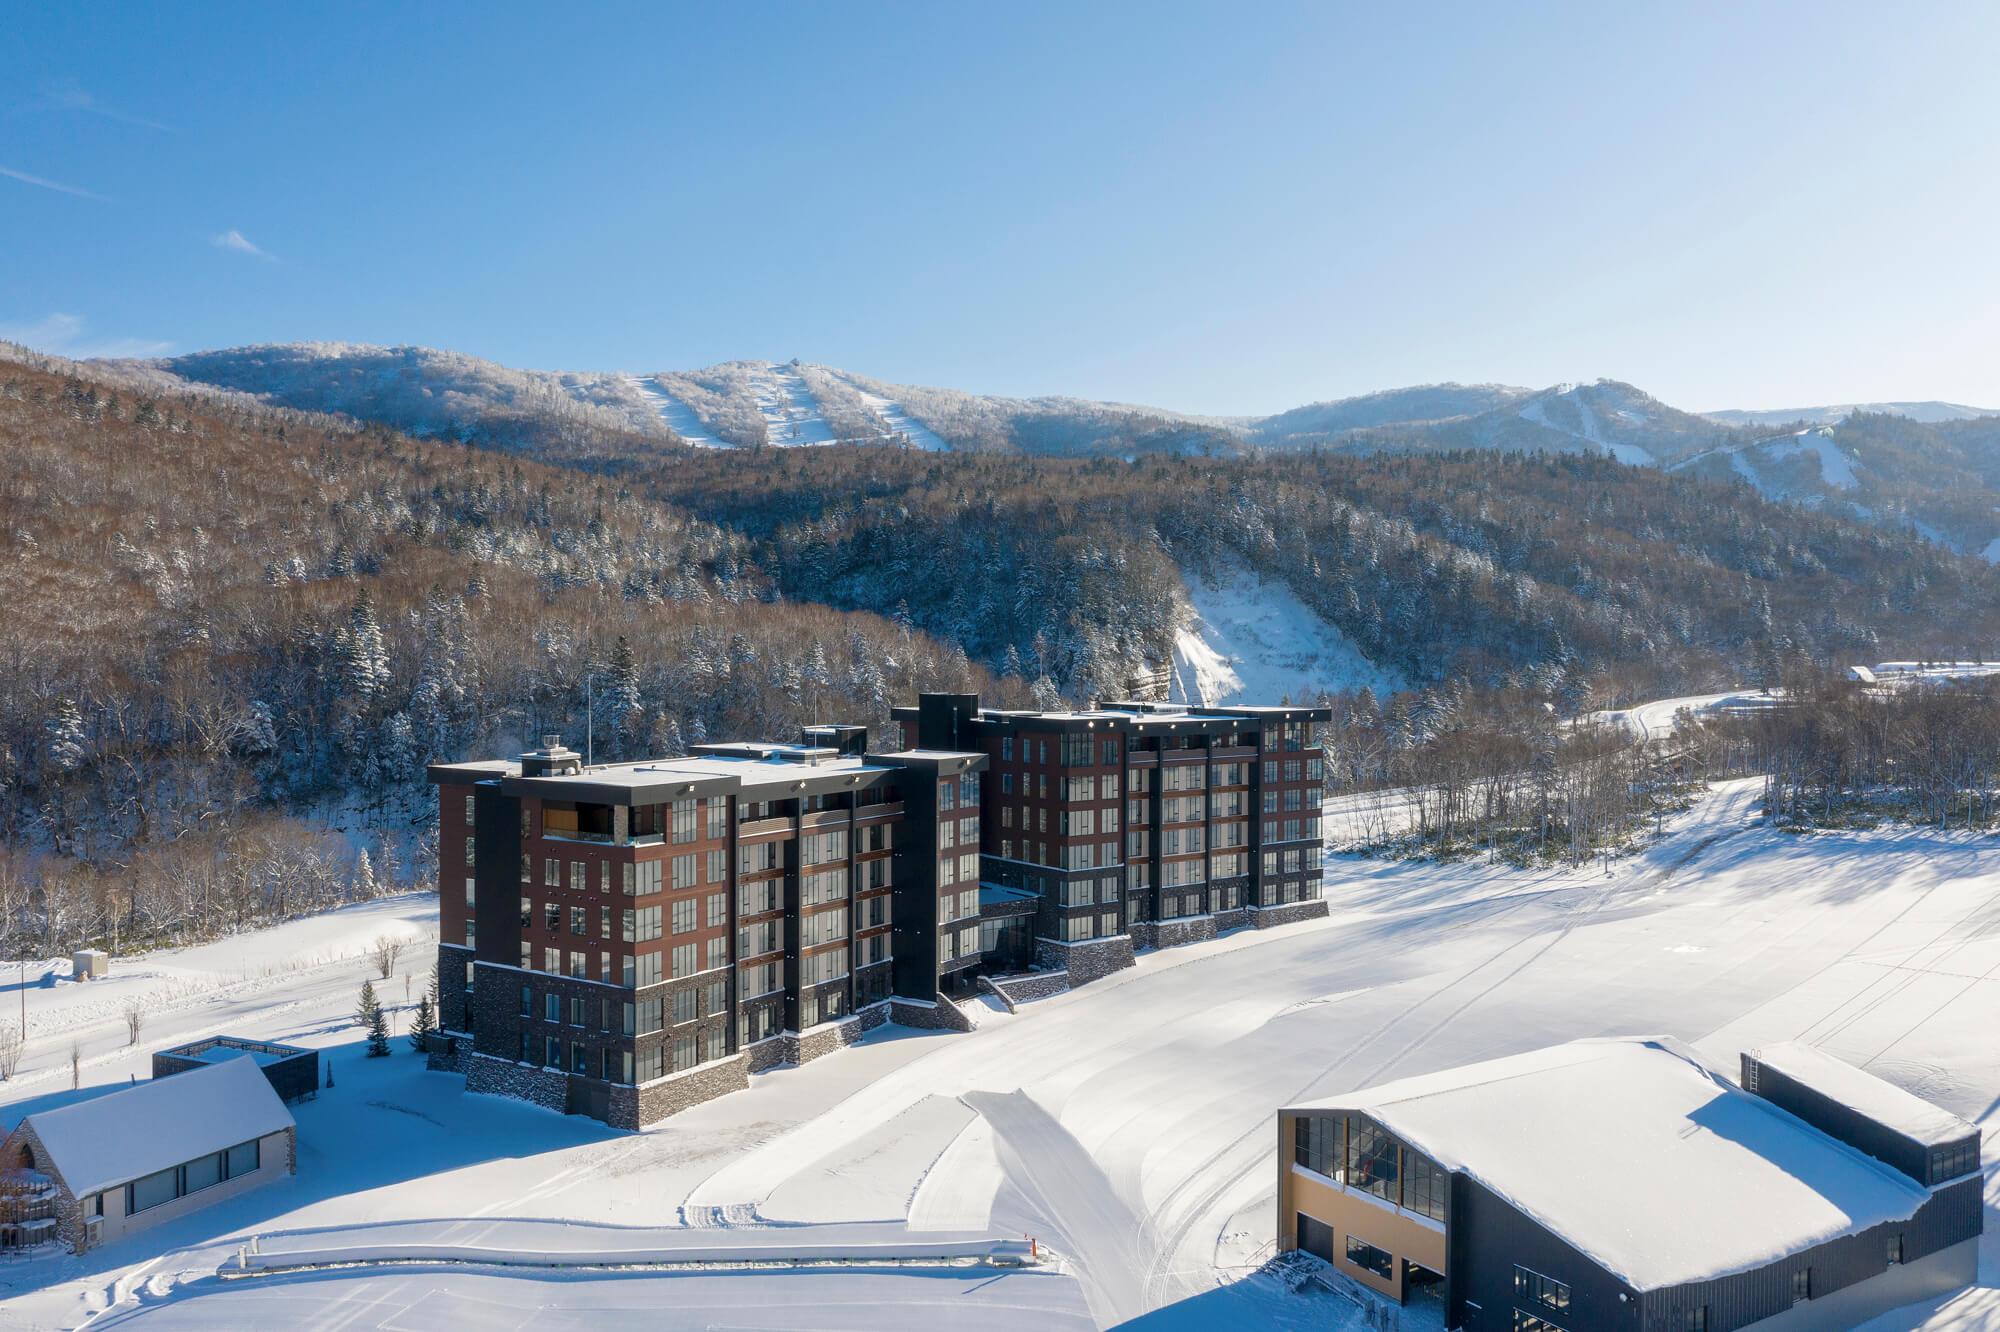 Kiroro – A Perfect Winter Getaway